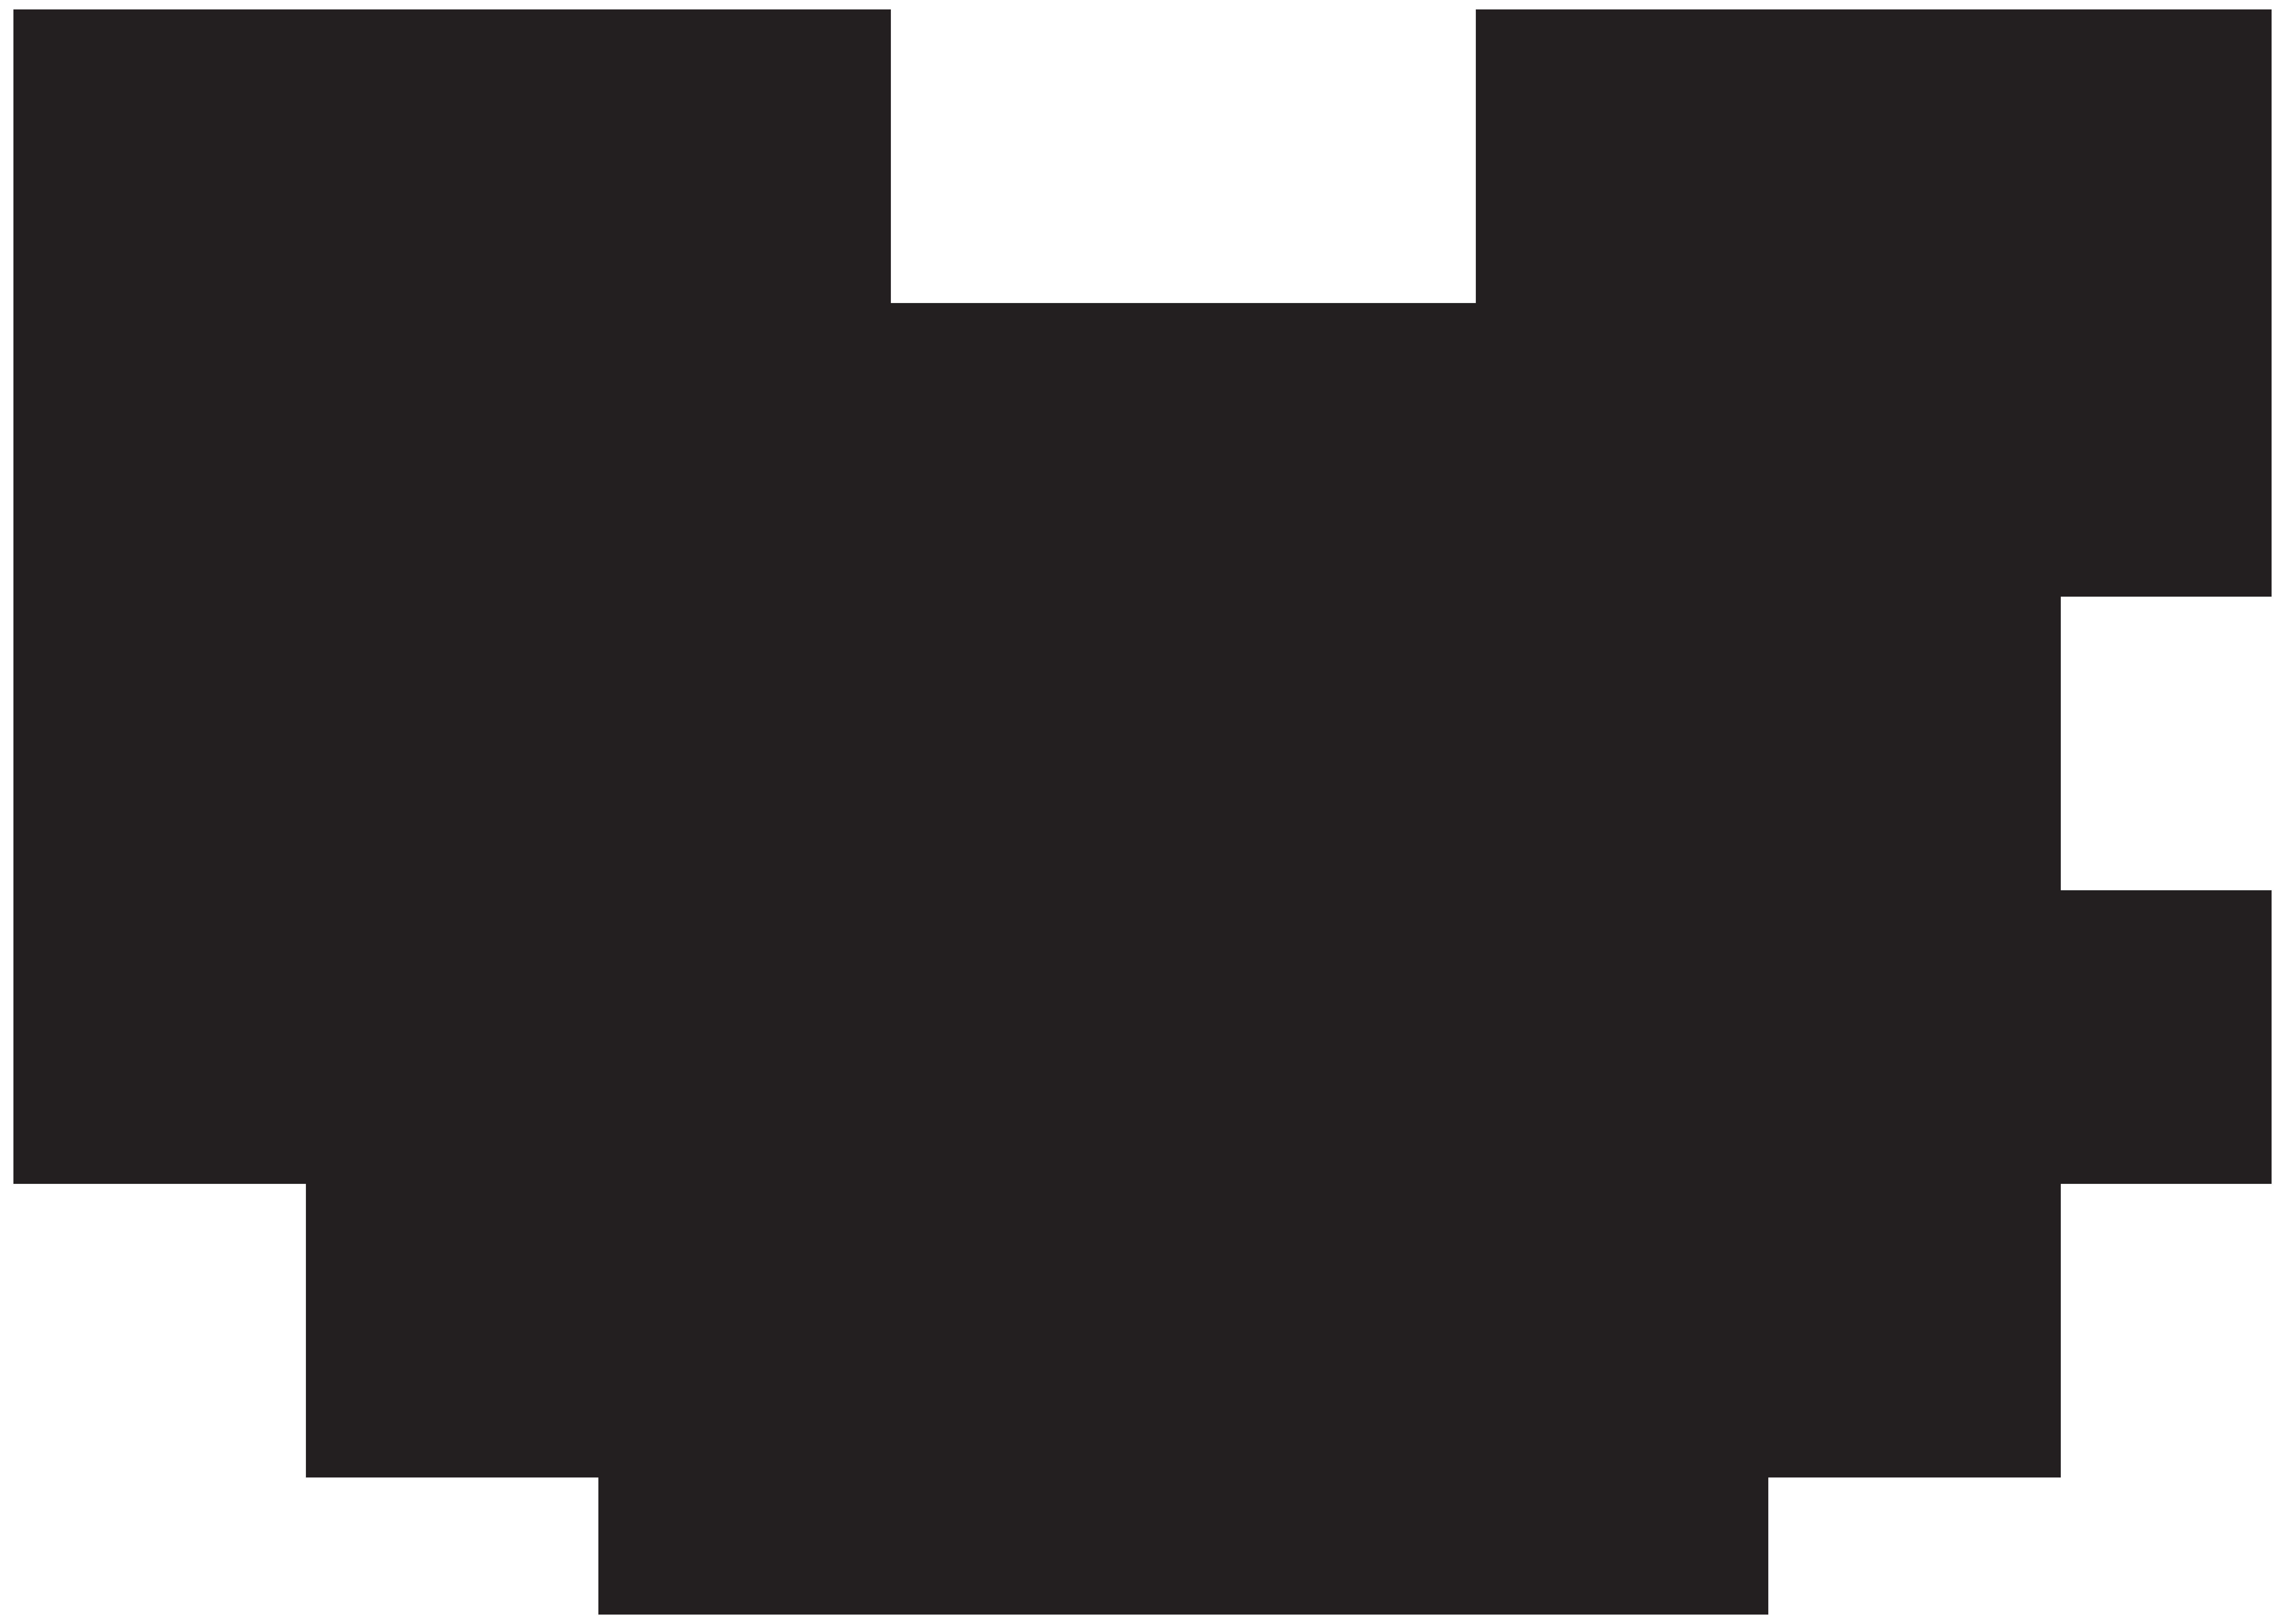 8000x5686 Cute Monkeys Silhouette Png Transparent Clip Art Imageu200b Gallery